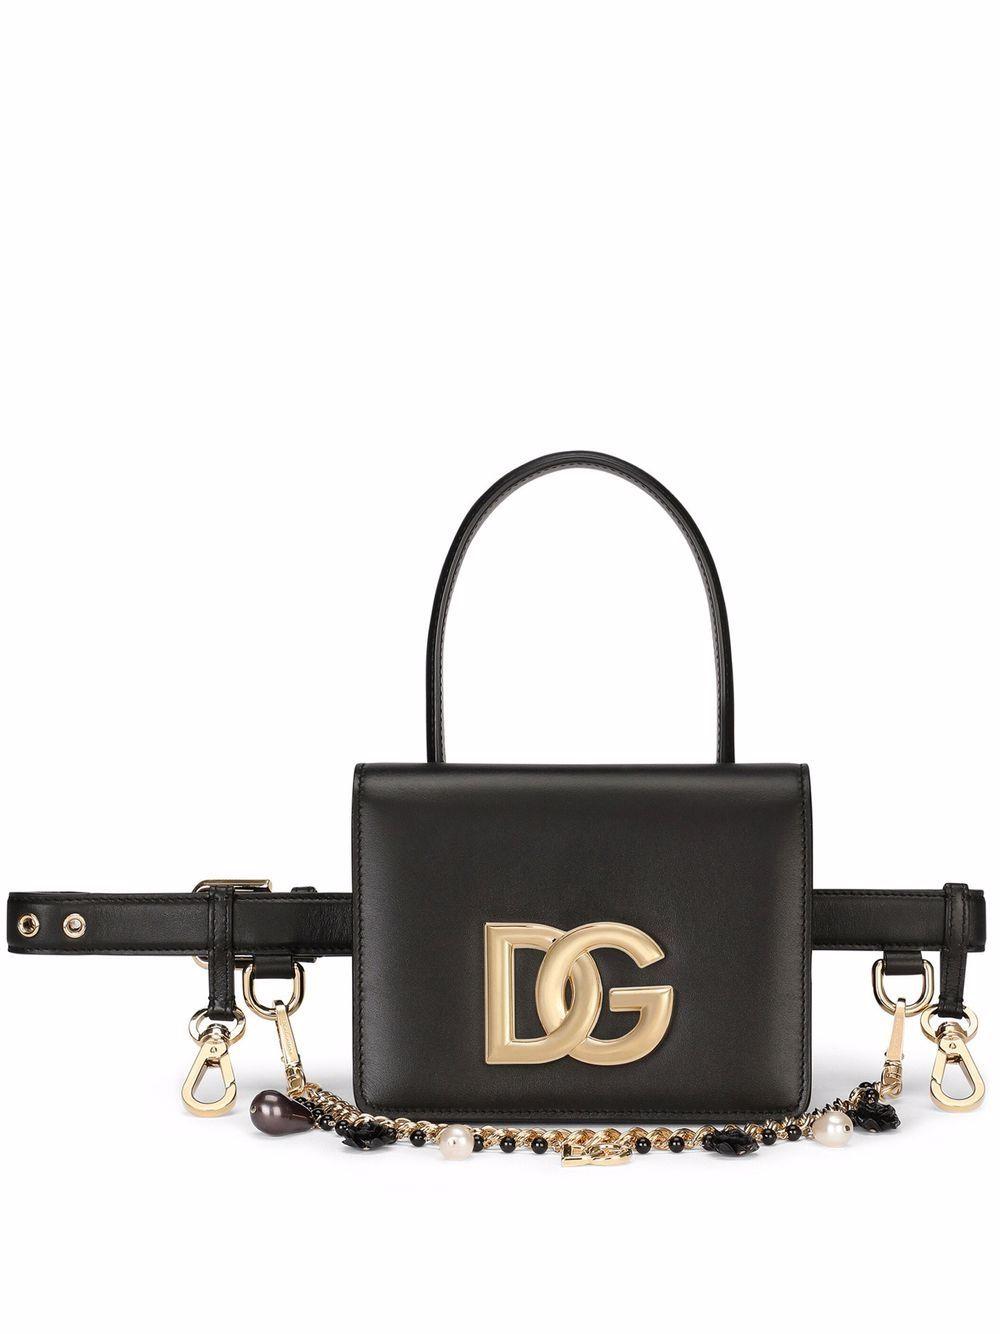 Dolce & Gabbana calf leather belt bag - Schwarz